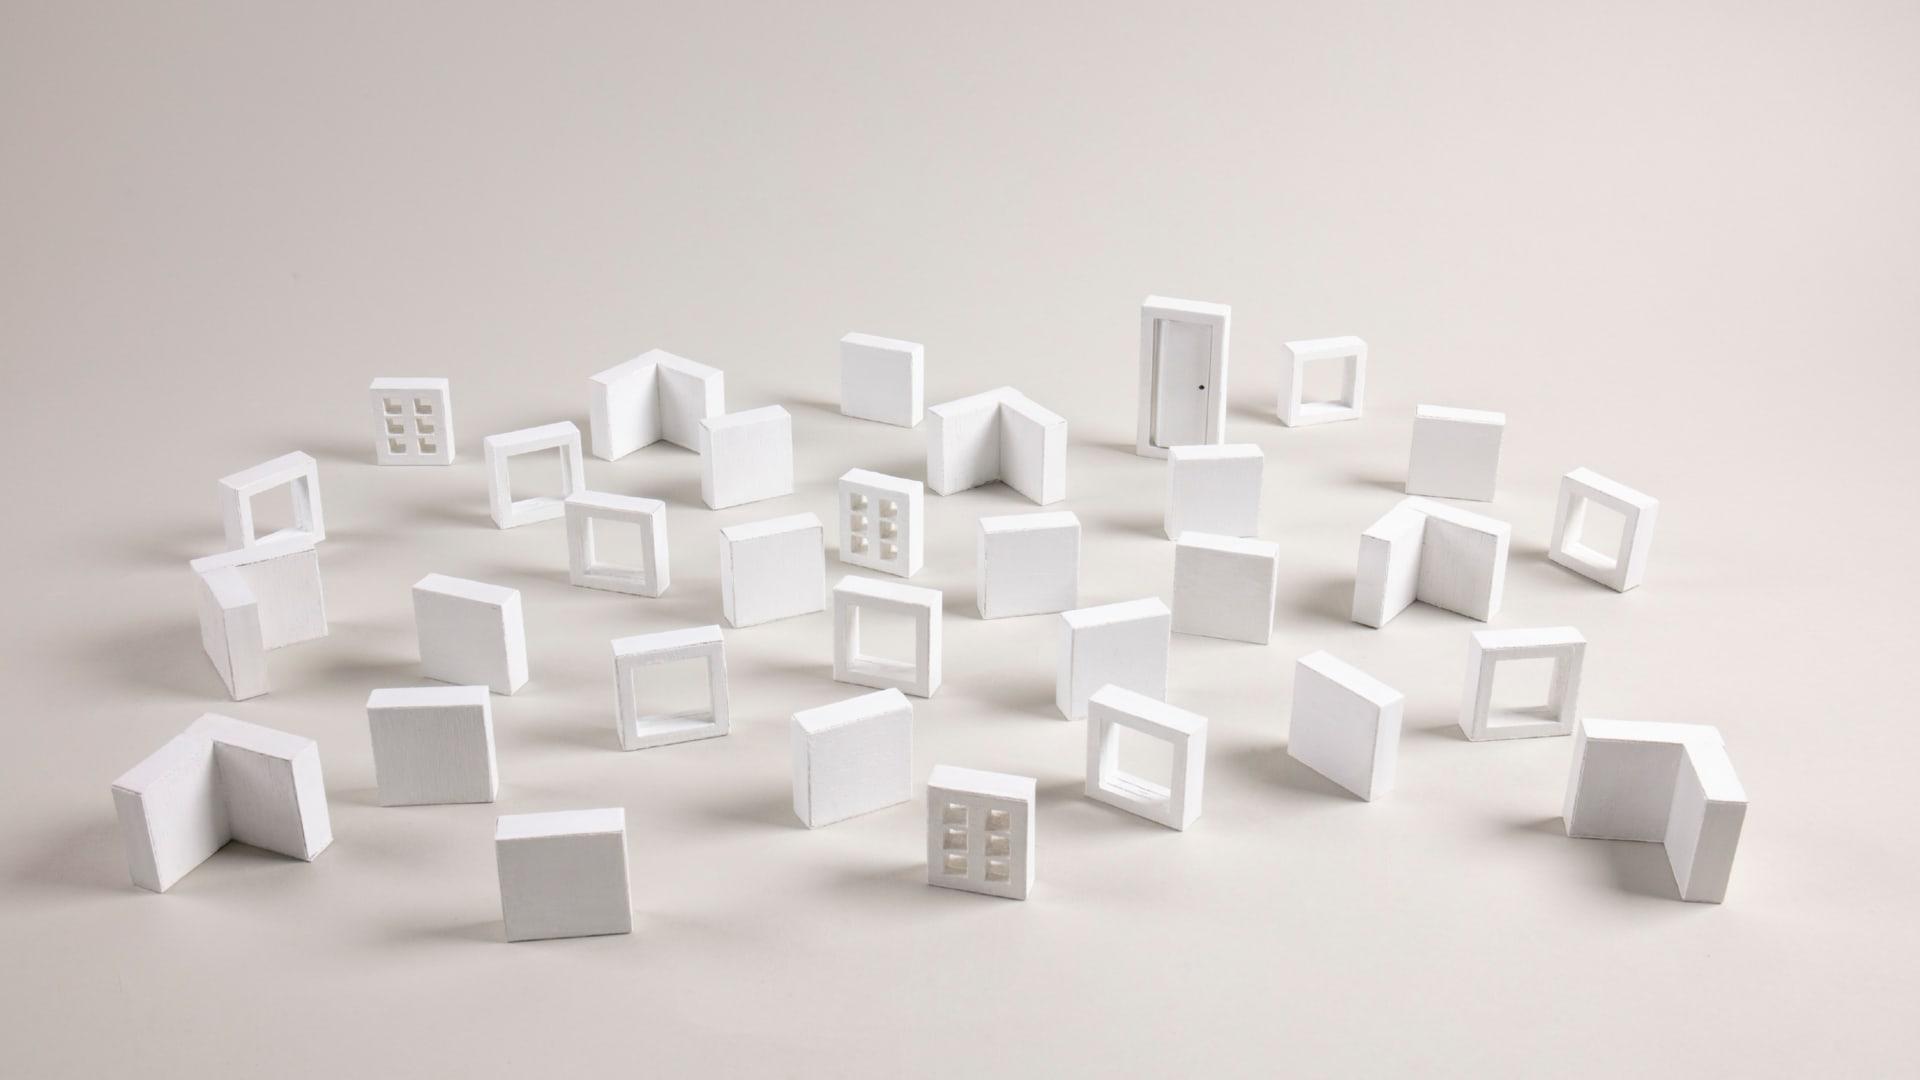 T.I.D.E. Toolkit - Modular Building Blocks